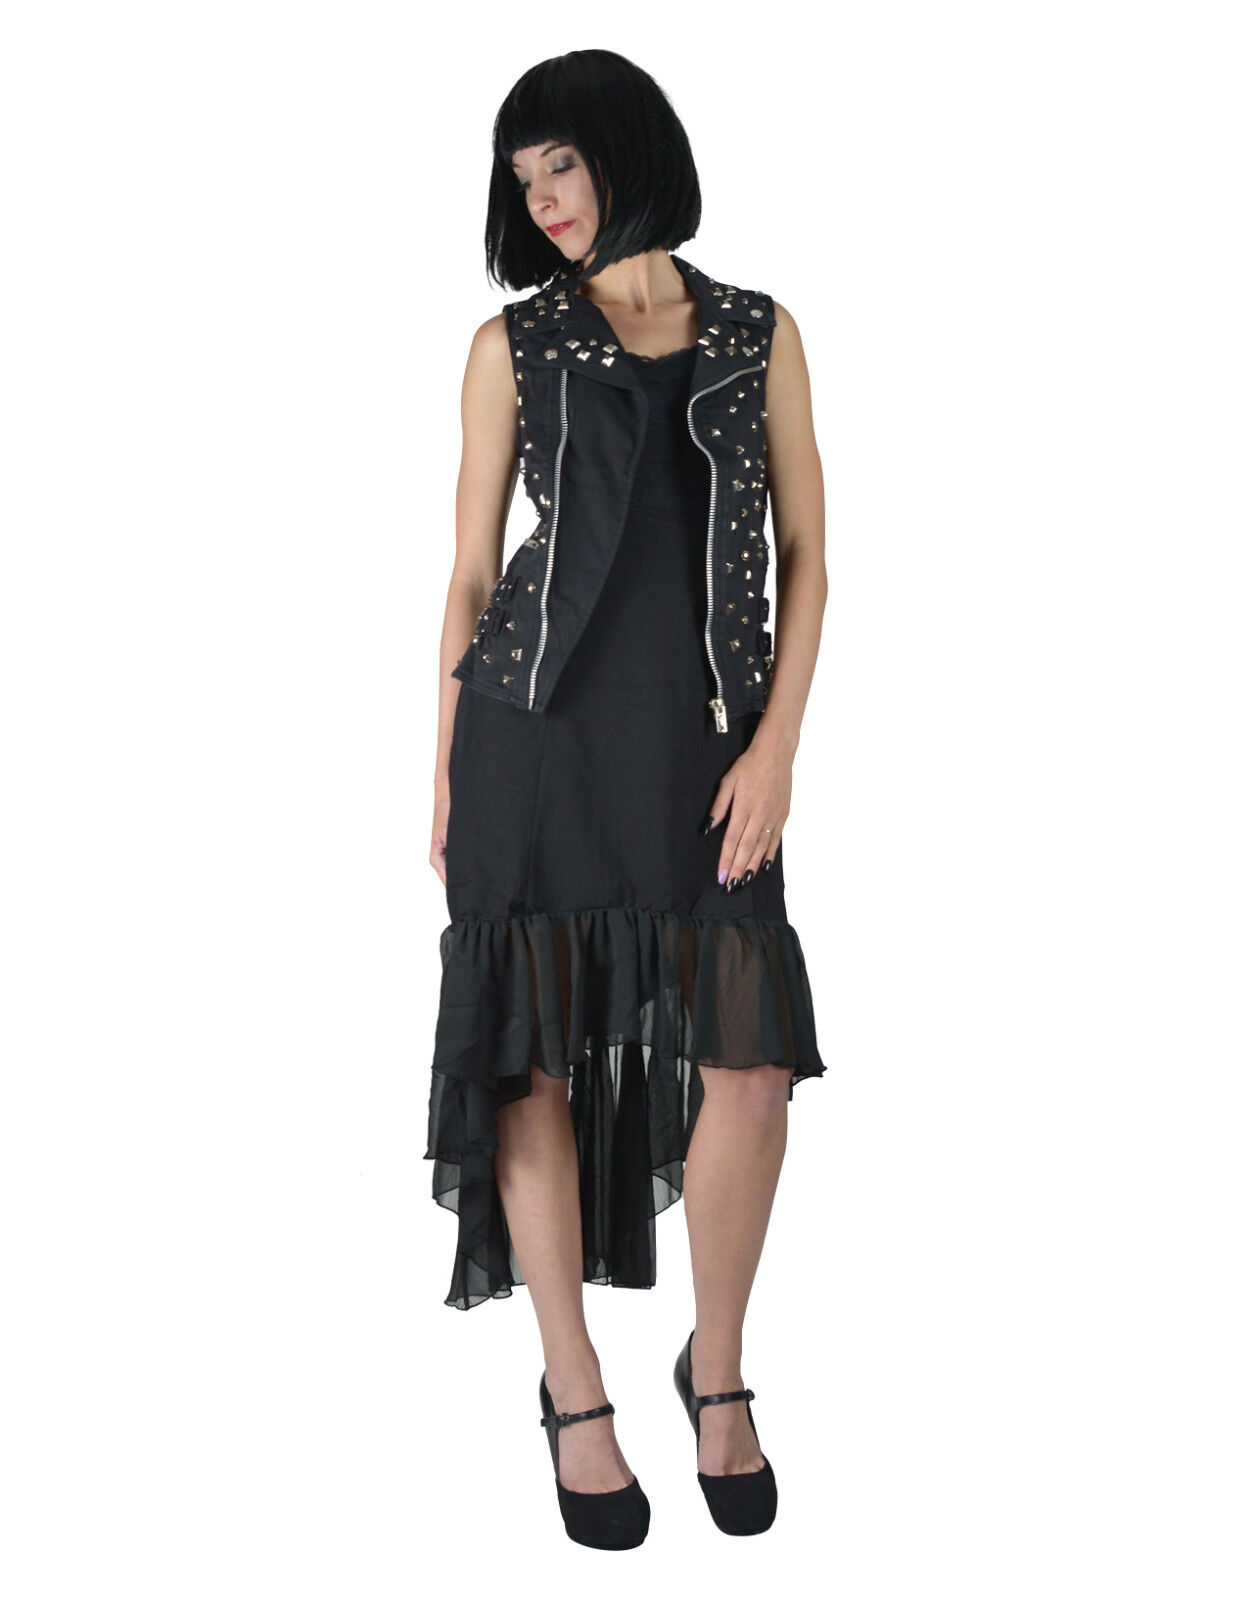 TRIPP GOTHIC BAND MOTO ROCKABILLY PUNK ROCK BIKER BLACK STUDDED VEST IS9465 XS Clothing, Shoes & Accessories